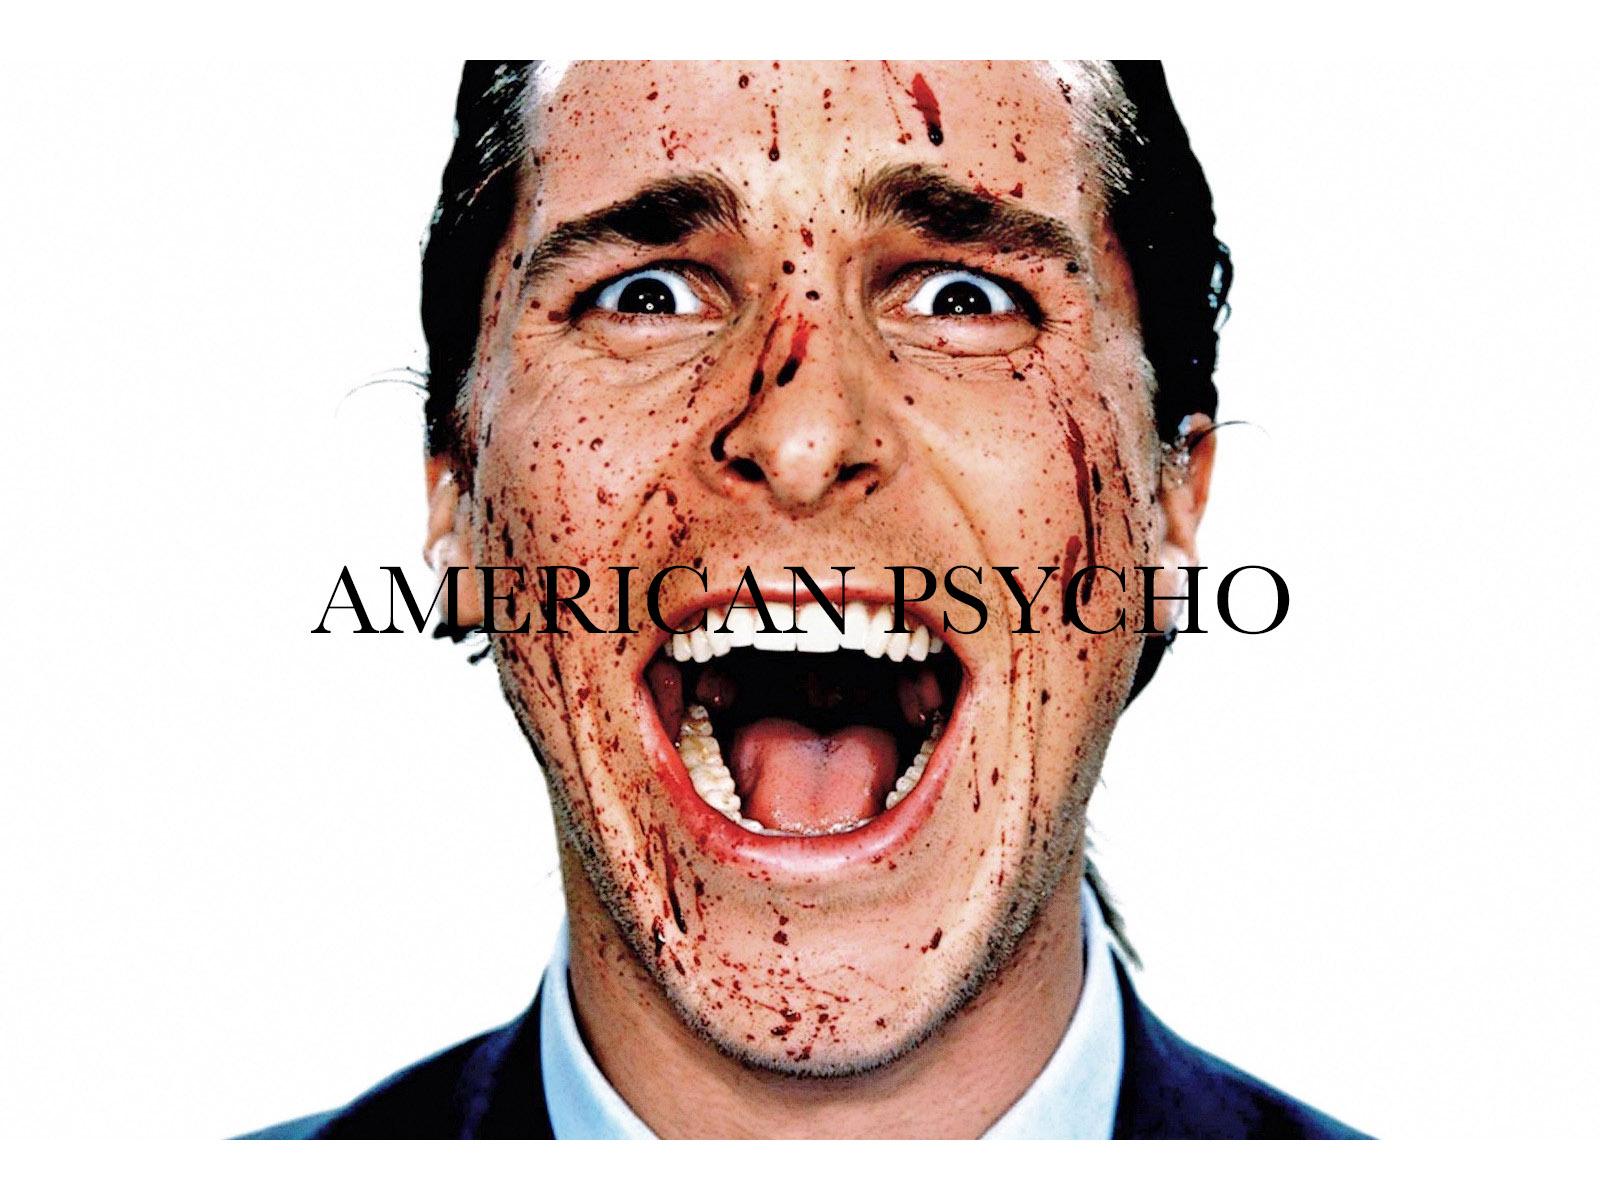 [MOVIE] AMERICAN PSYCHO – アメリカン・サイコ